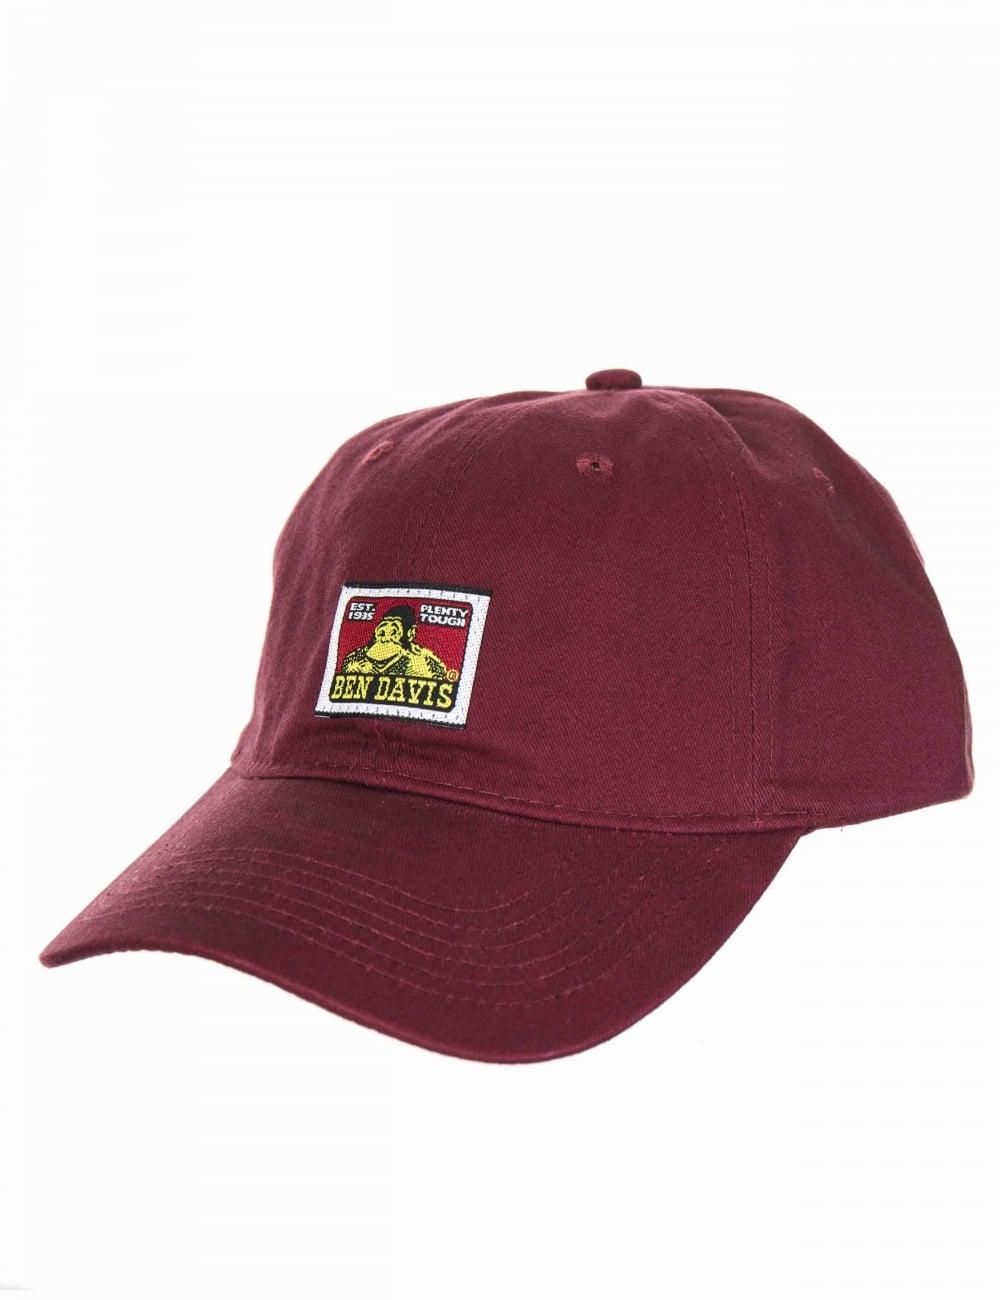 ec3cc189fed Ben Davis Patch Logo Twill Strap Back Cap - Maroon - Accessories ...